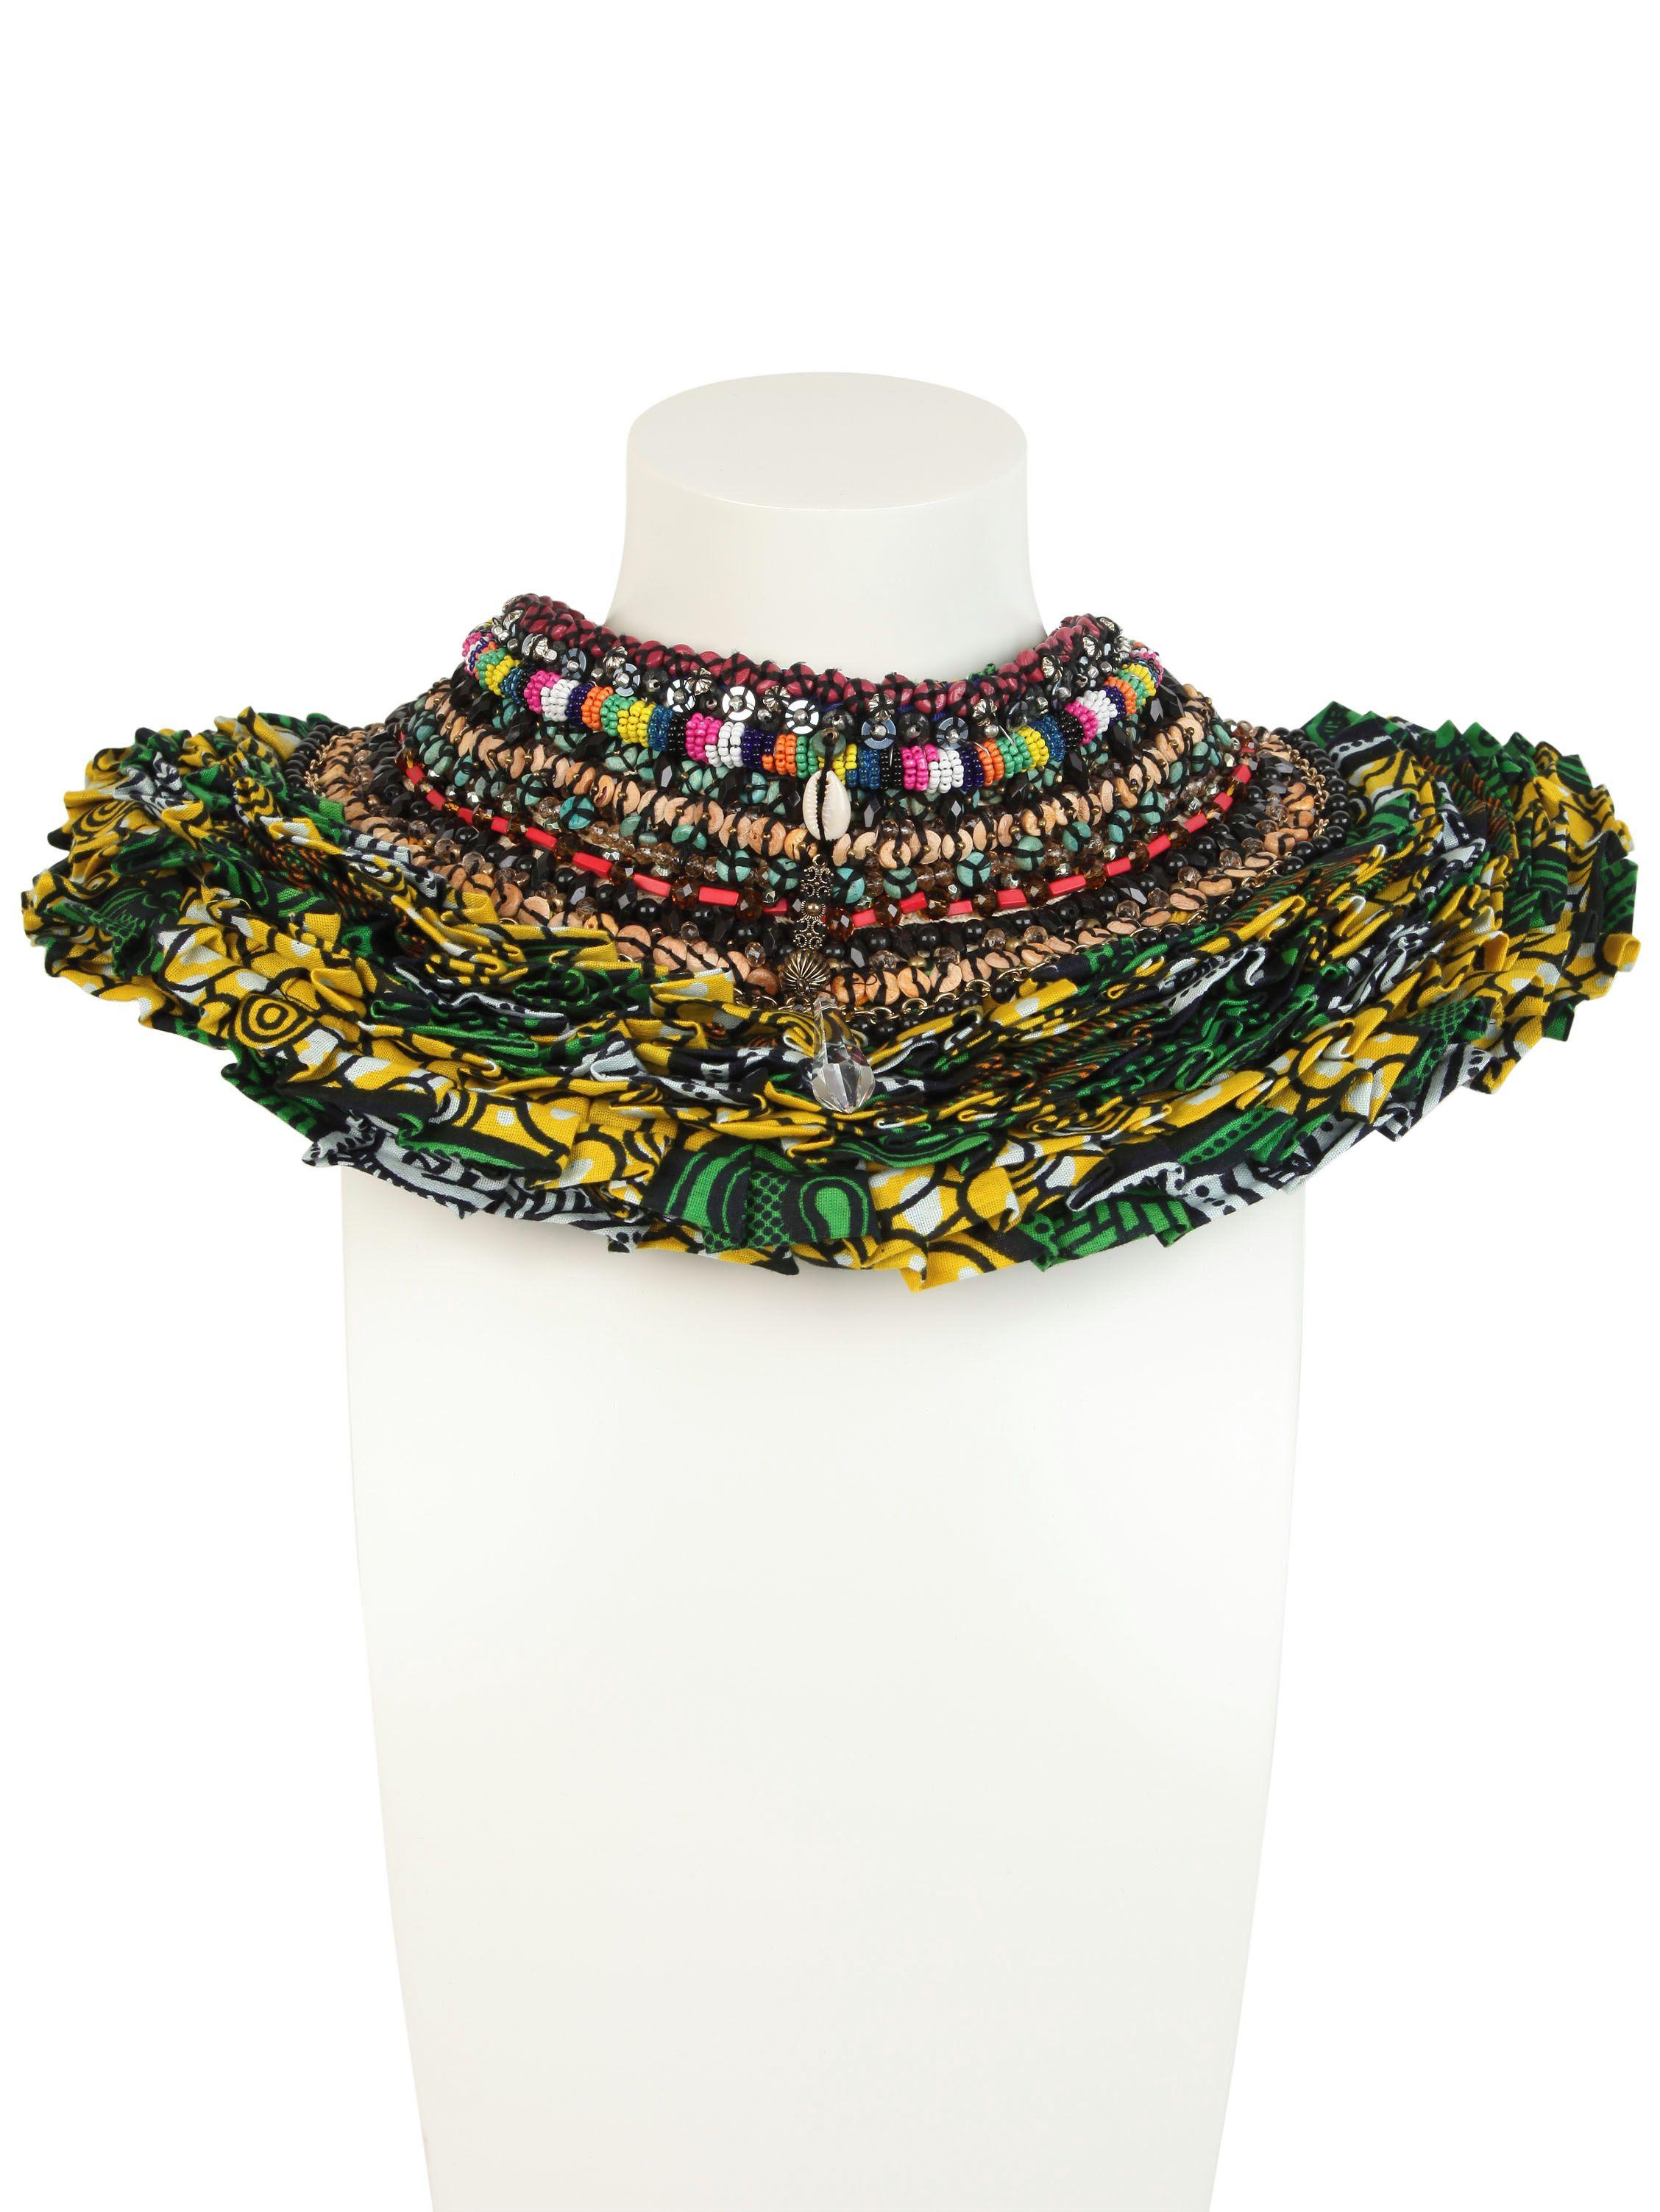 Anita Quansah London Reva Necklace in Green